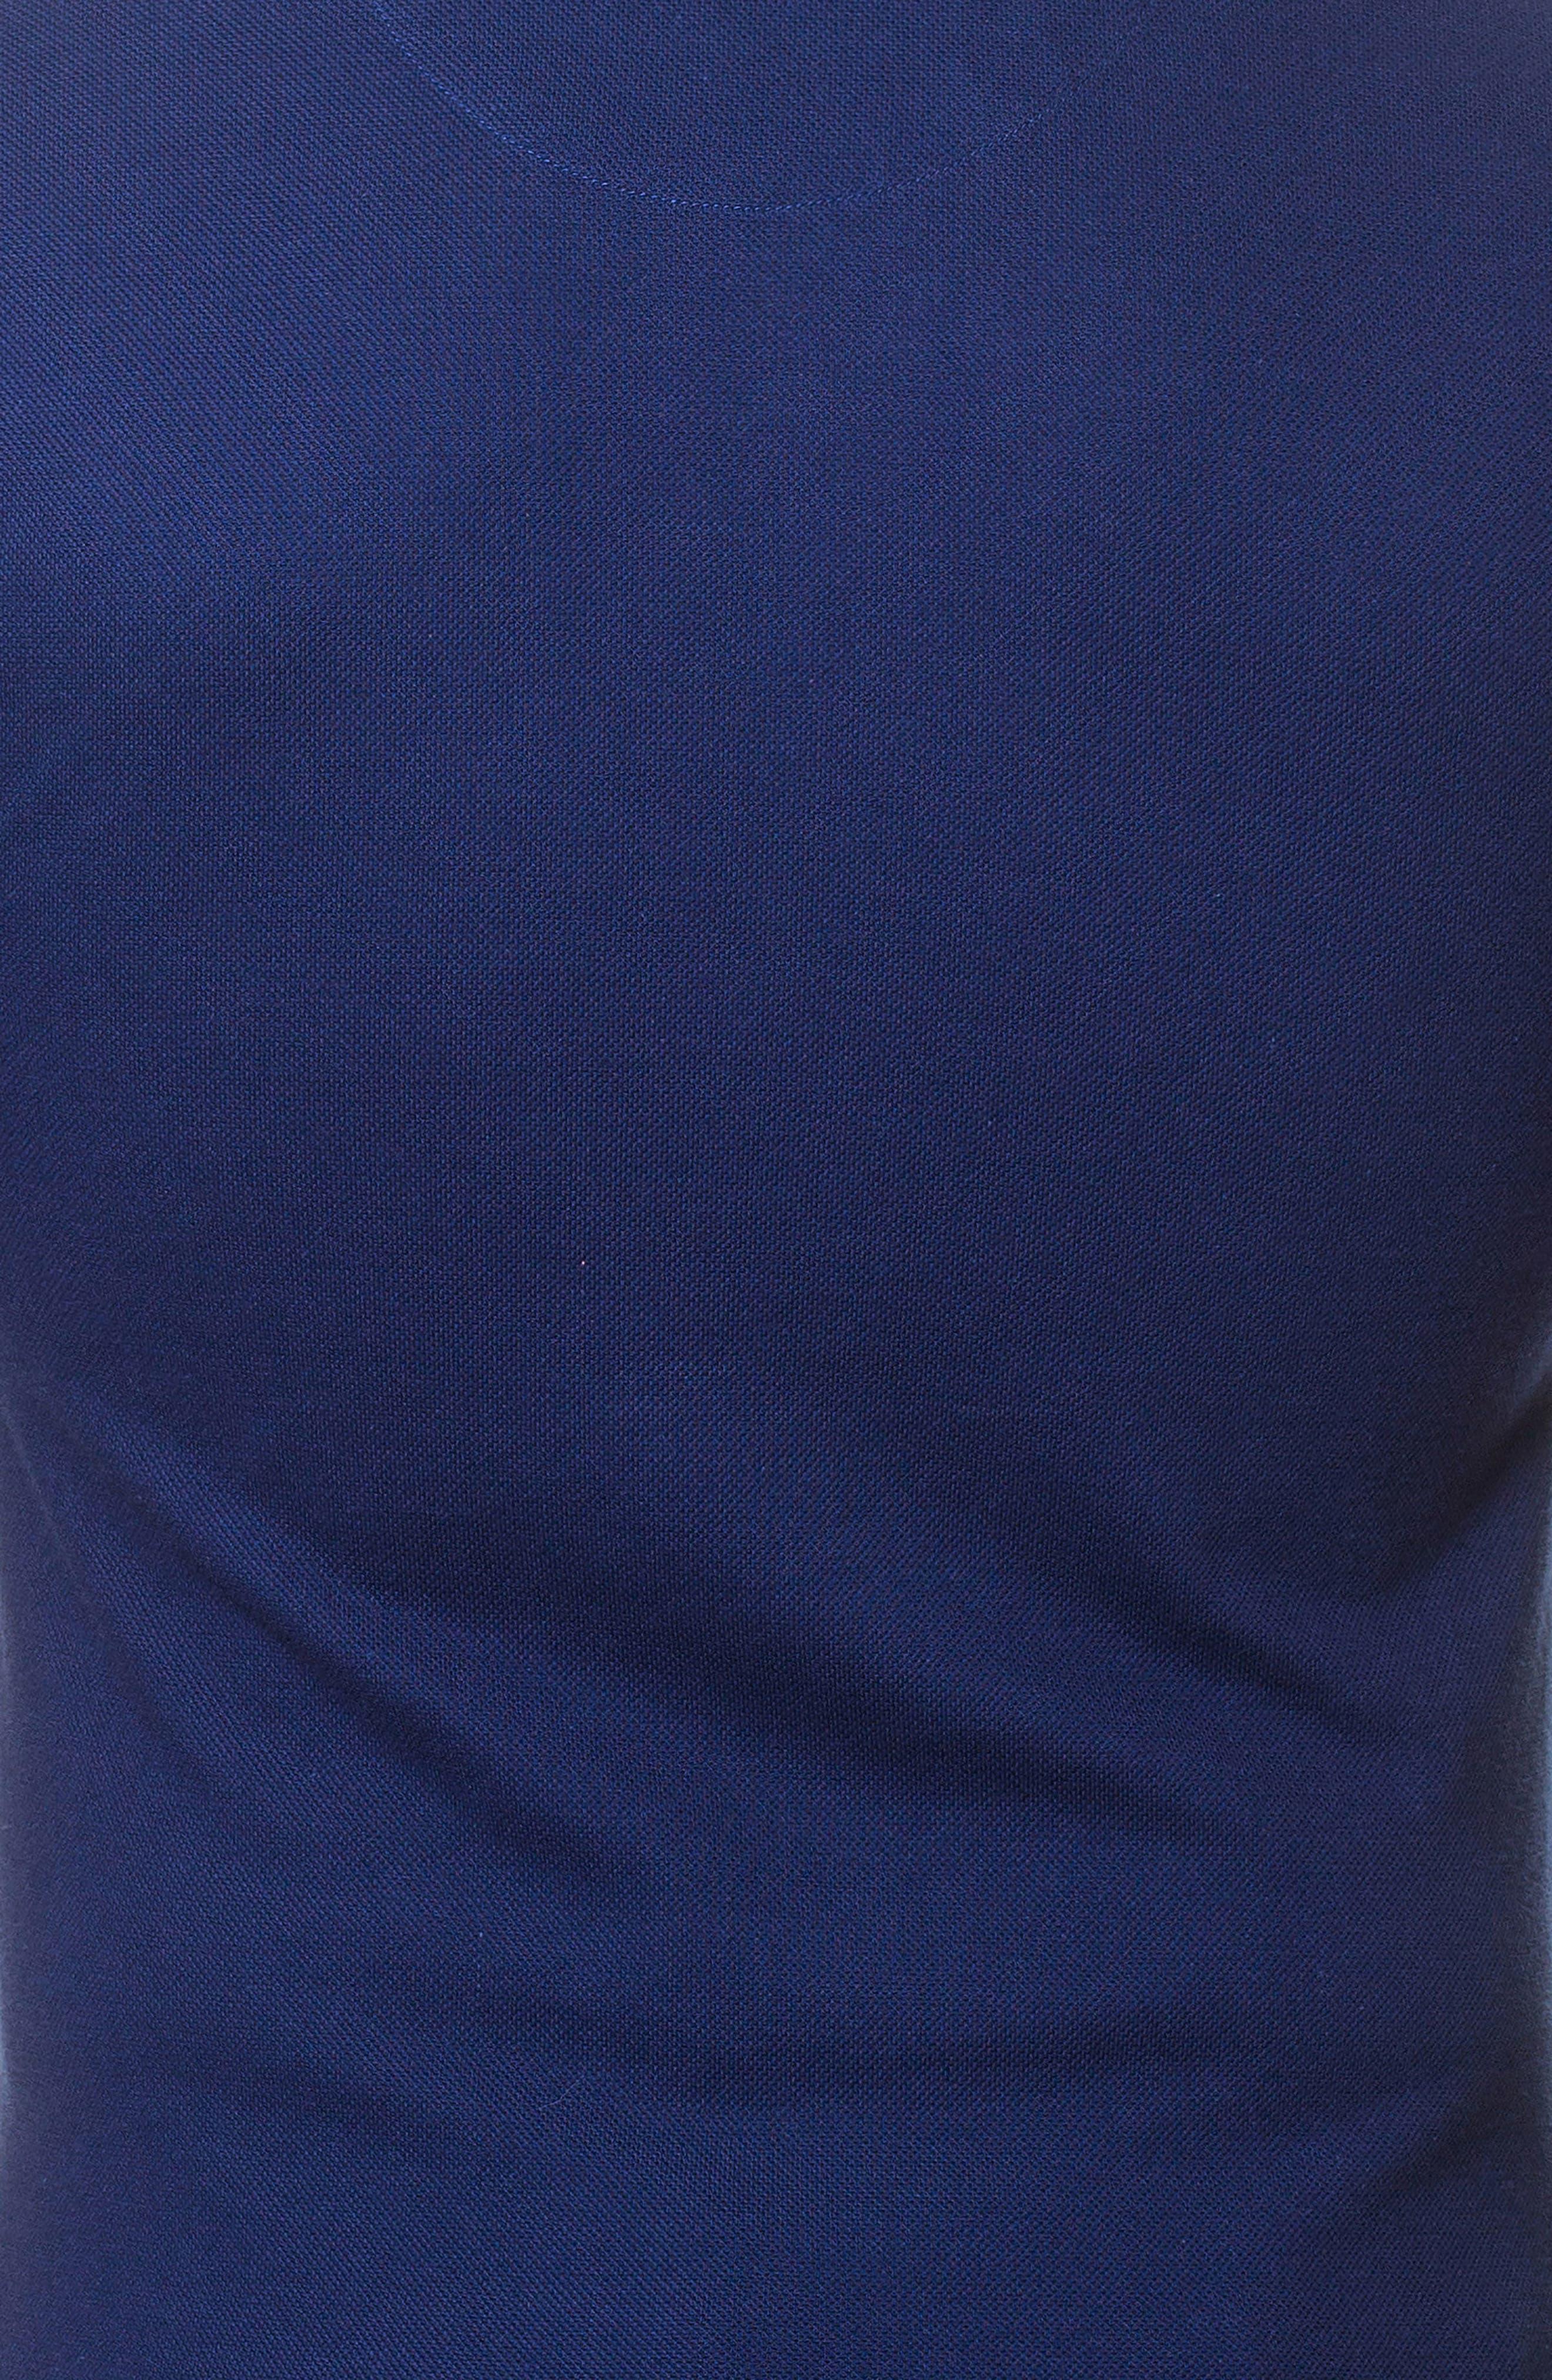 Short Sleeve V-Neck Piqué T-Shirt,                             Alternate thumbnail 3, color,                             BLUE